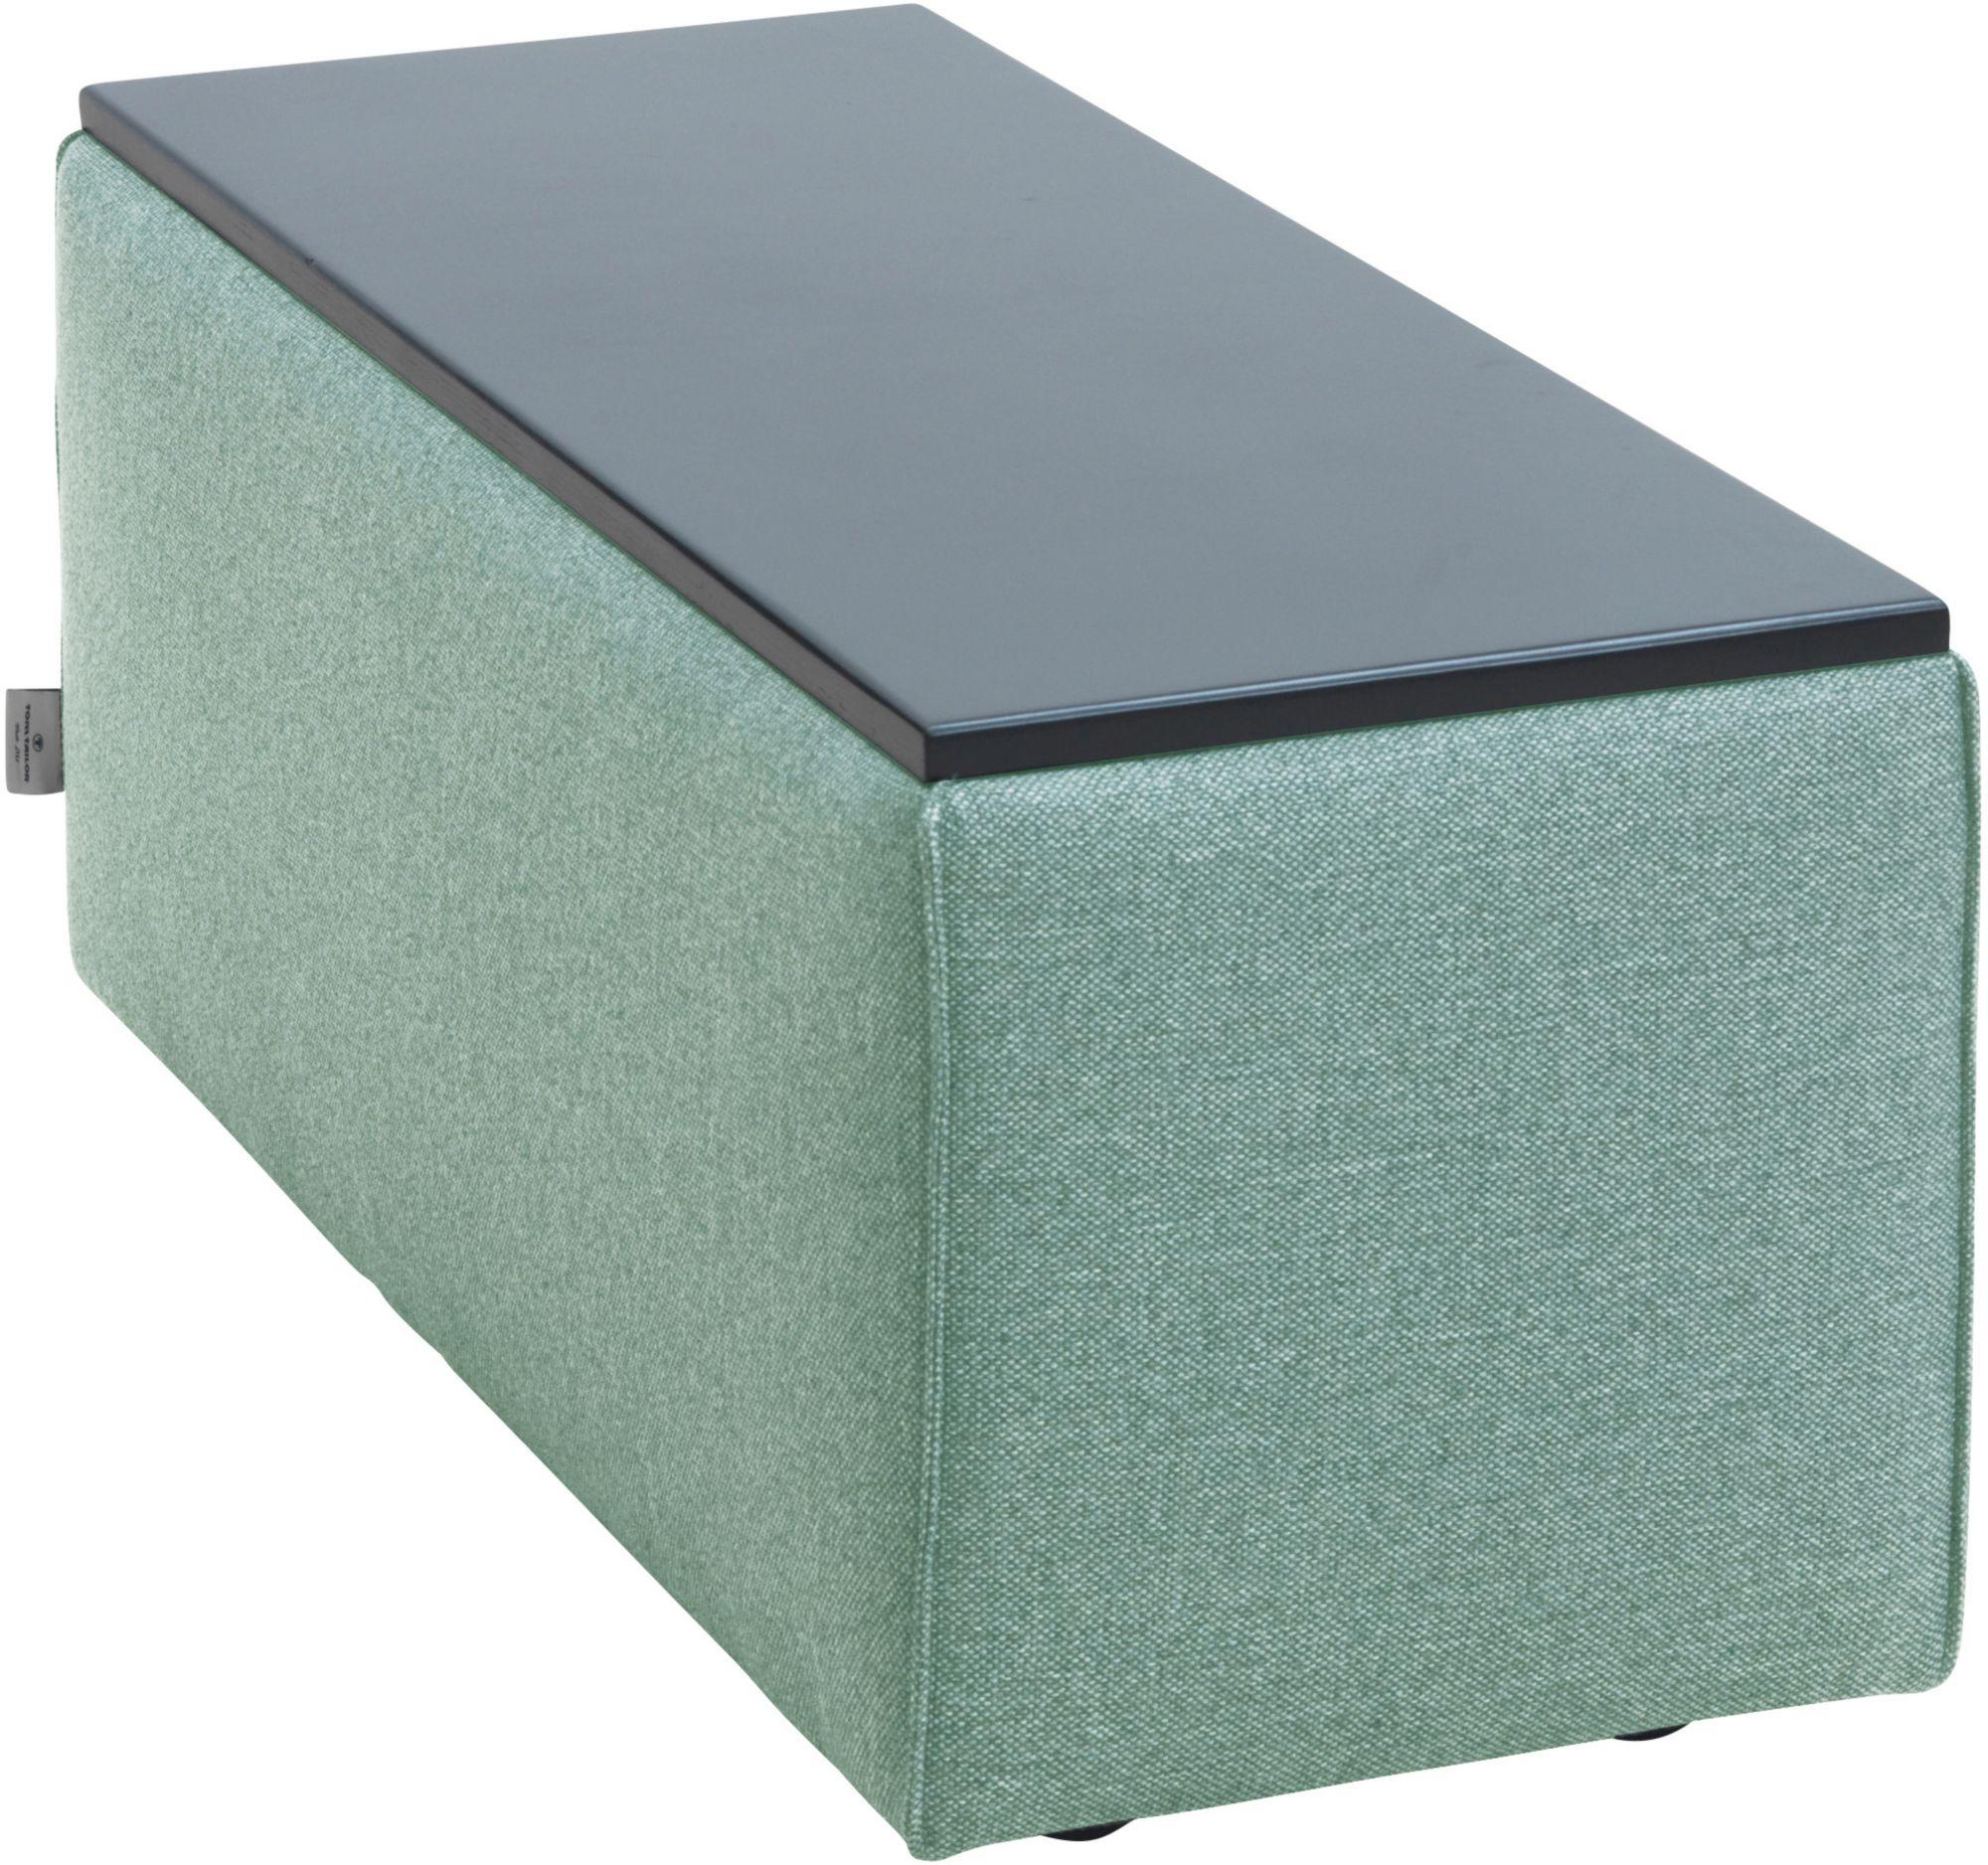 sofaelemente im schwab online shop m bel sofas couches. Black Bedroom Furniture Sets. Home Design Ideas